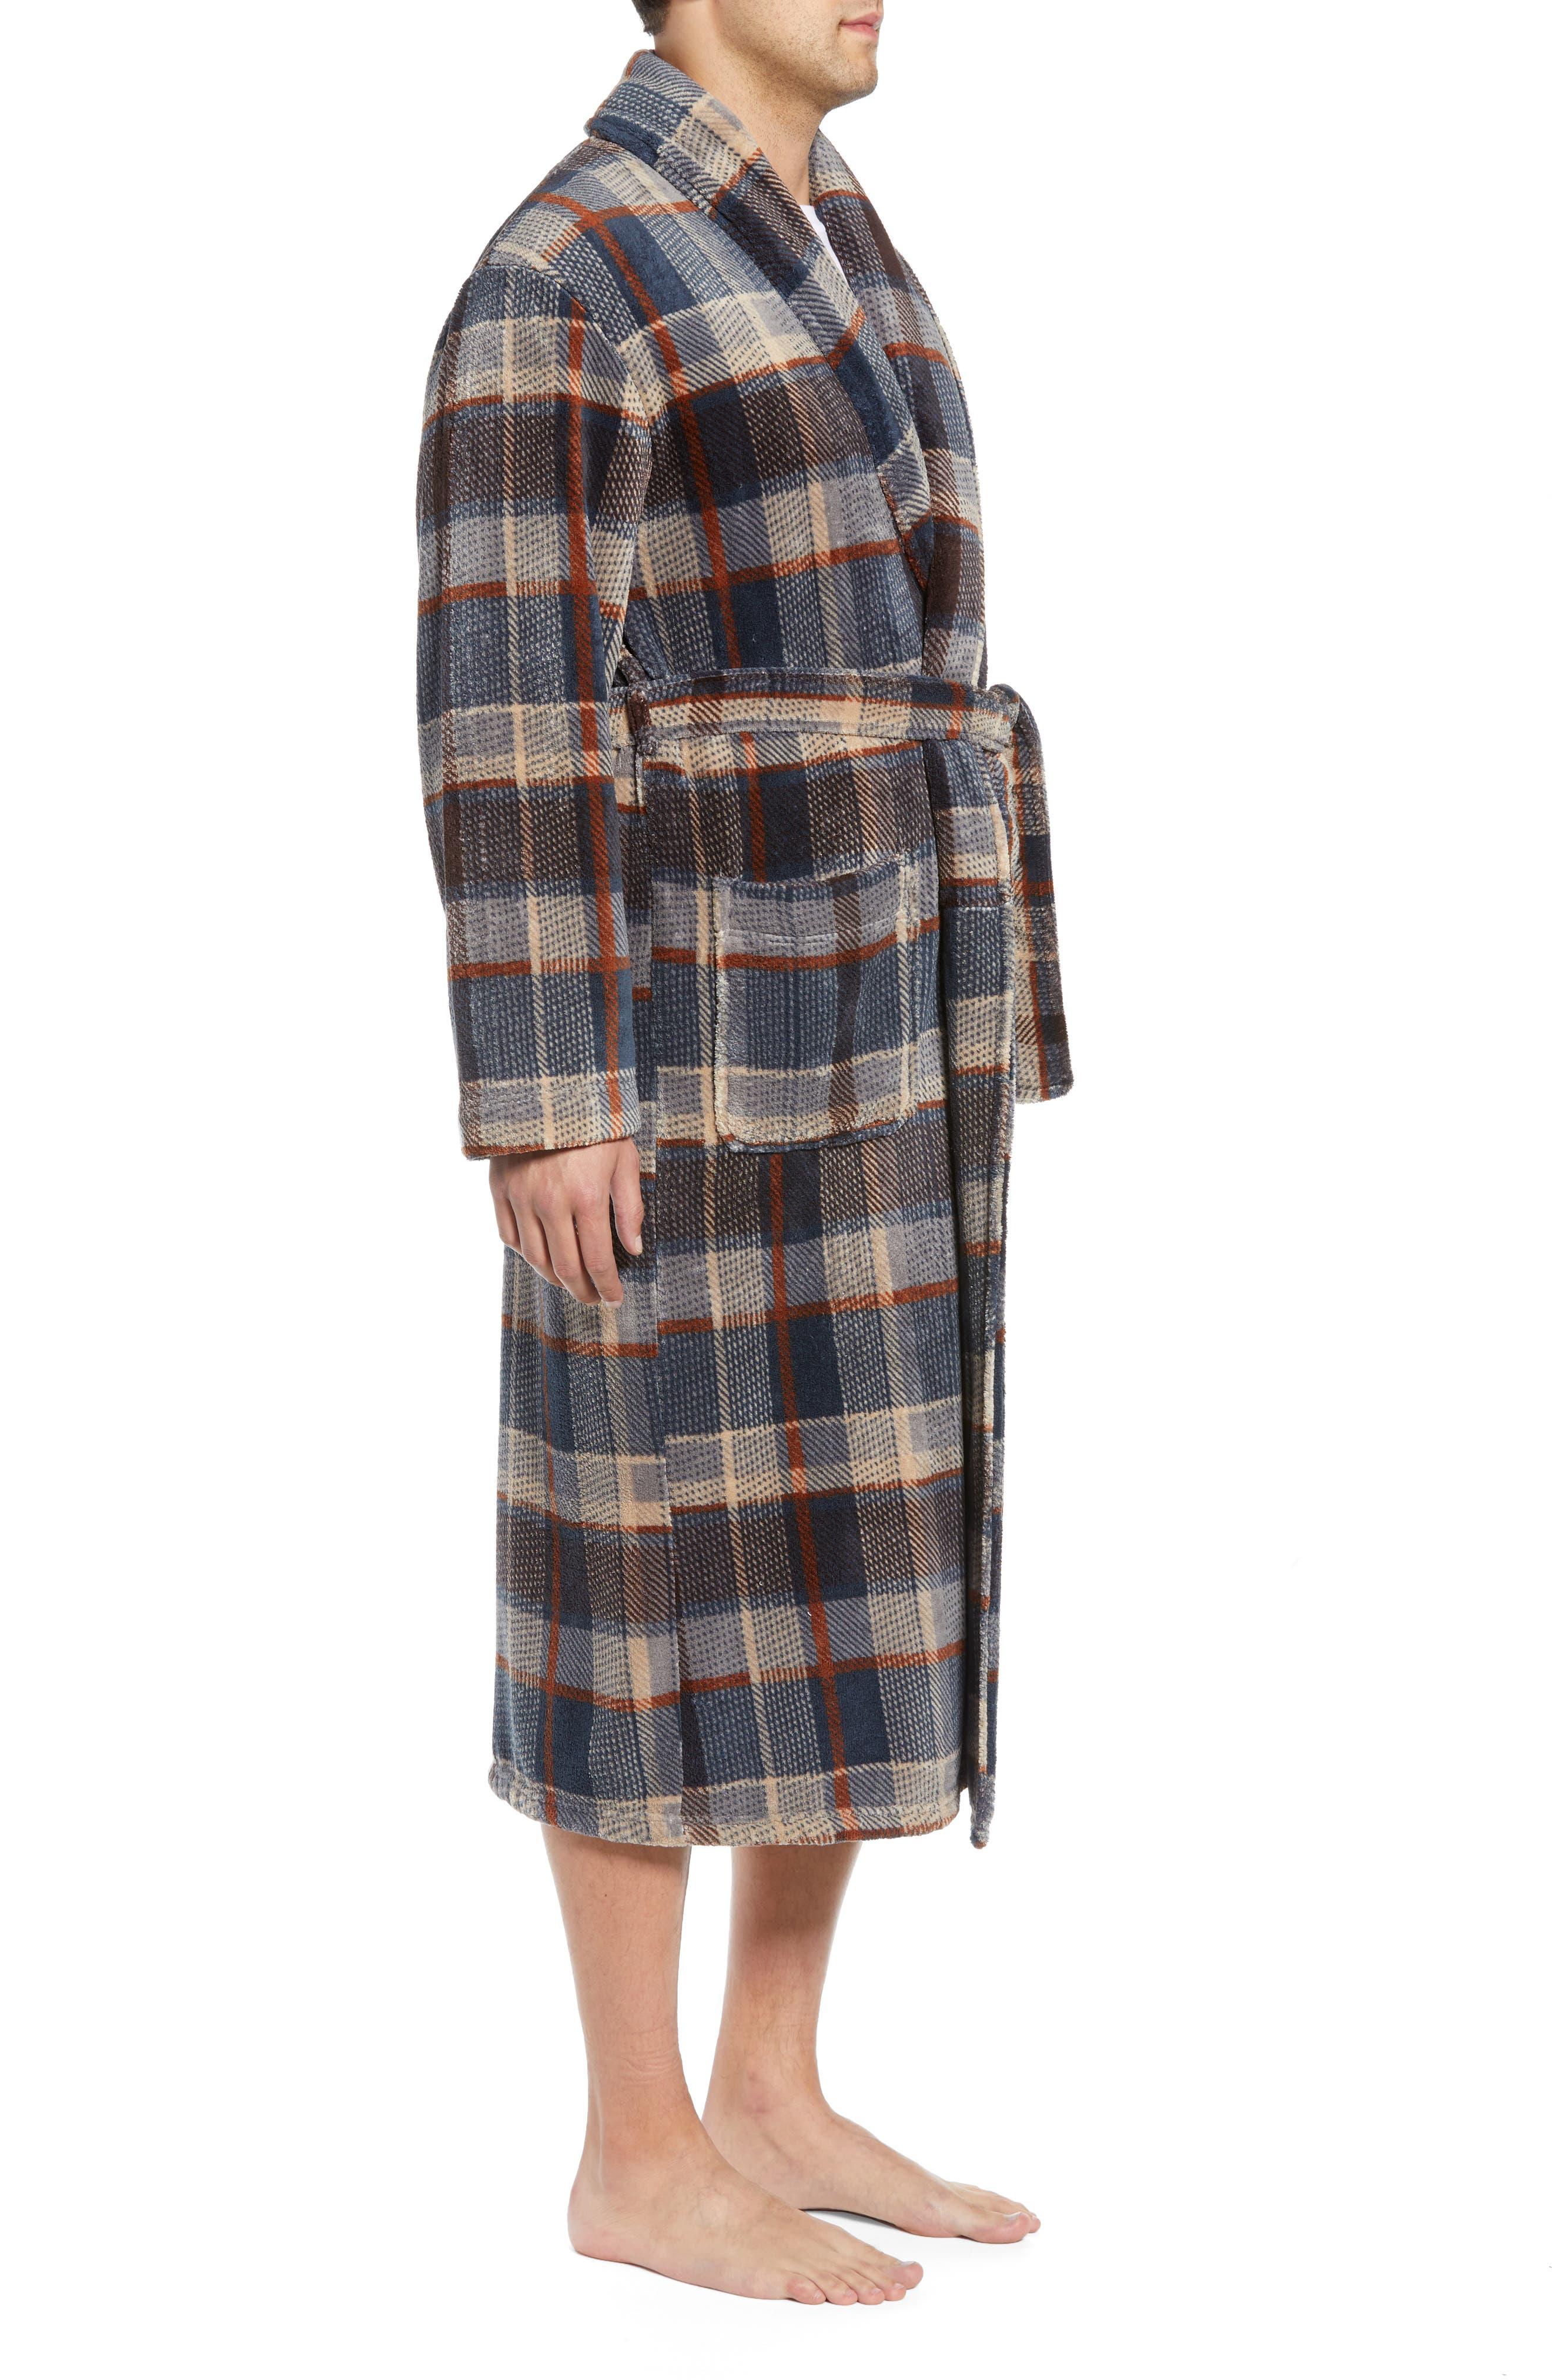 MAJESTIC INTERNATIONAL, Mountains of Comfort Shawl Fleece Bath Robe, Alternate thumbnail 3, color, COFFEE